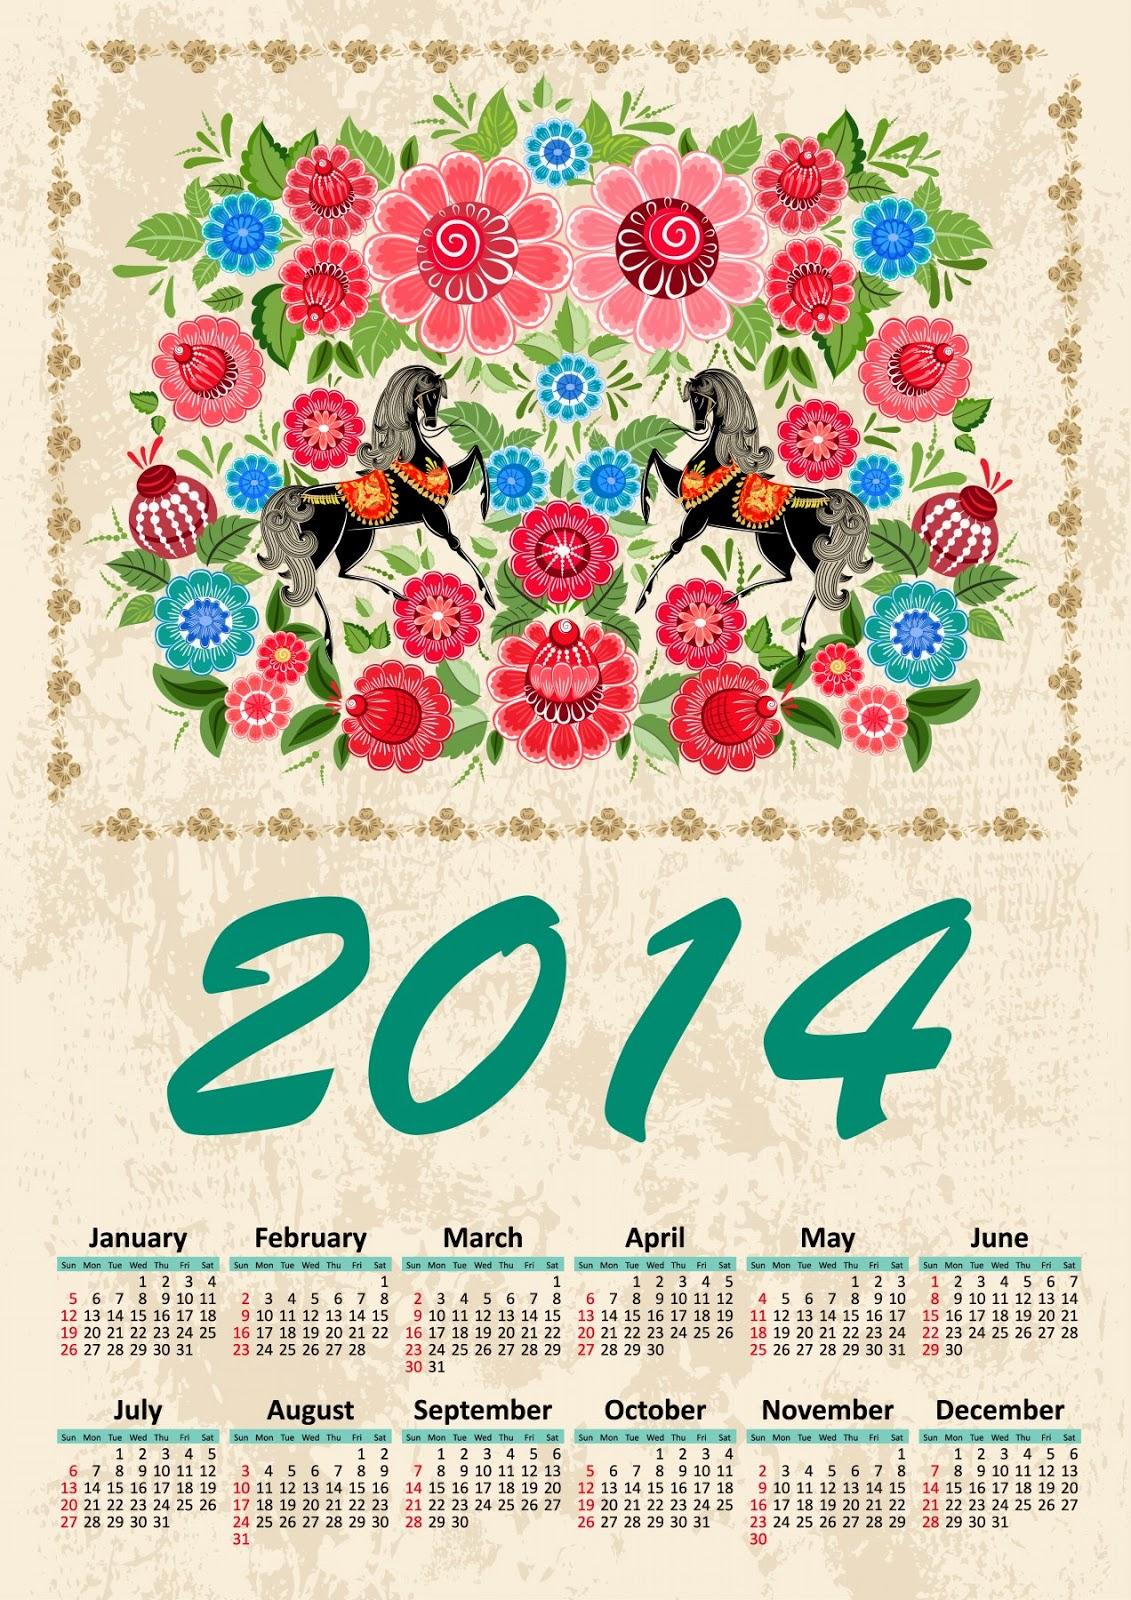 horses Flowers 2014 Calendar